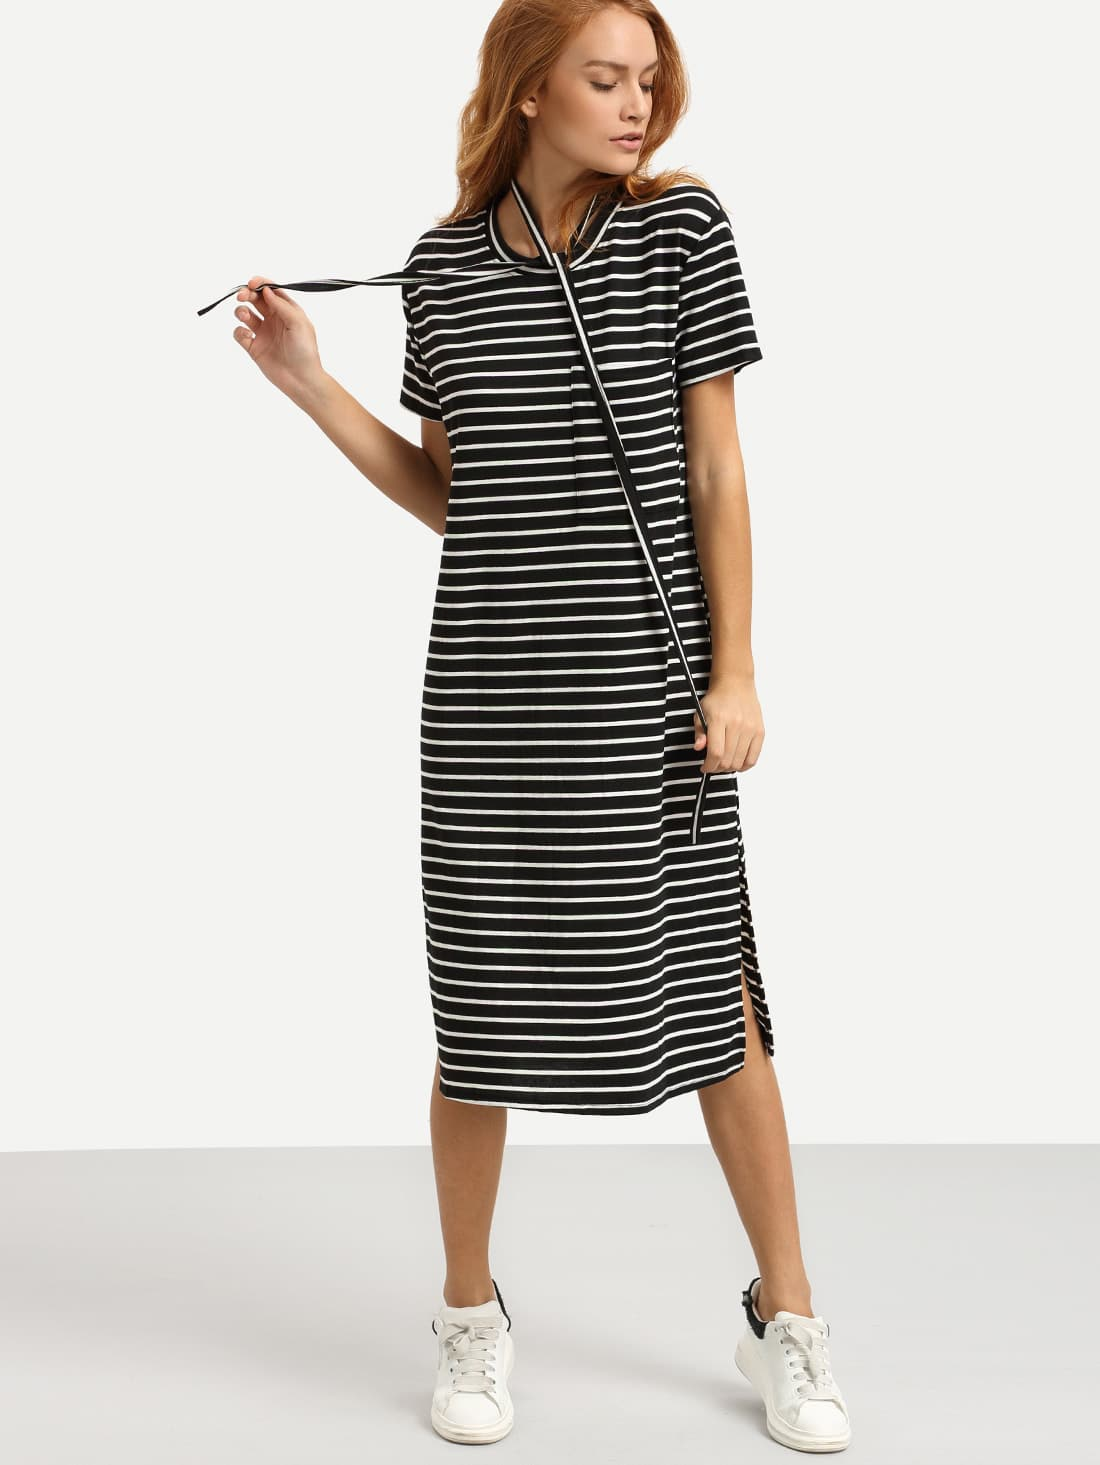 belted black white striped tee dress shein sheinside. Black Bedroom Furniture Sets. Home Design Ideas